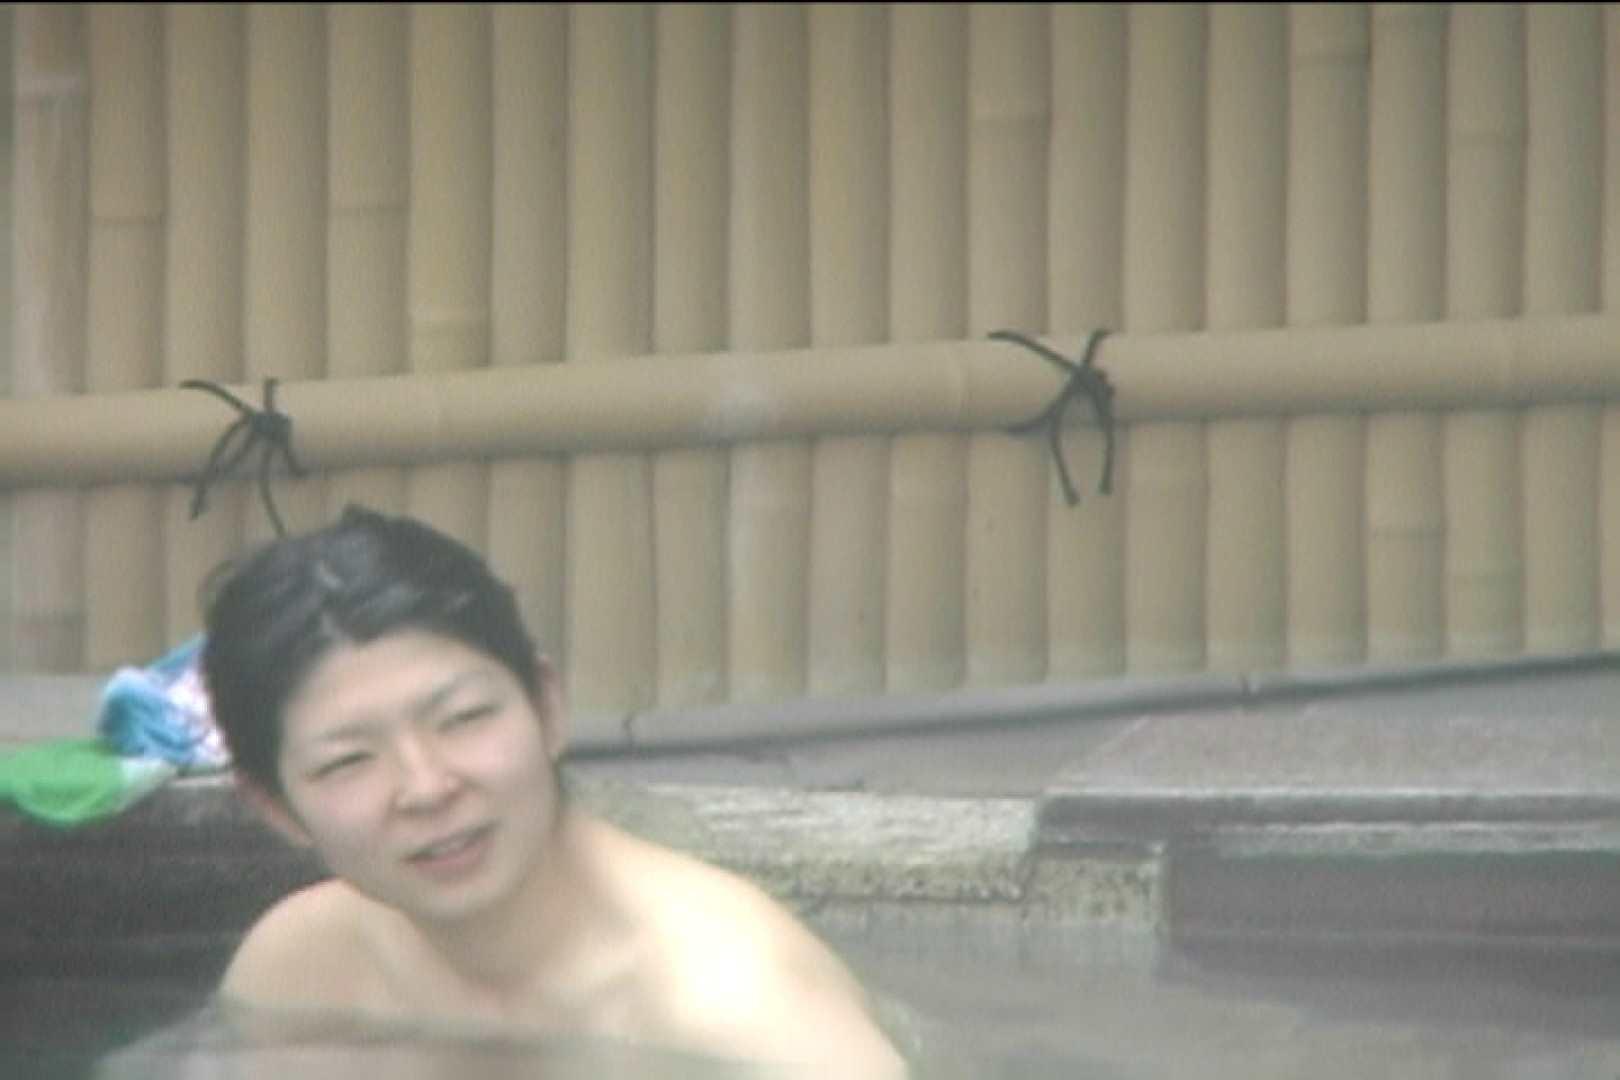 Aquaな露天風呂Vol.139 盗撮 | HなOL  53pic 3